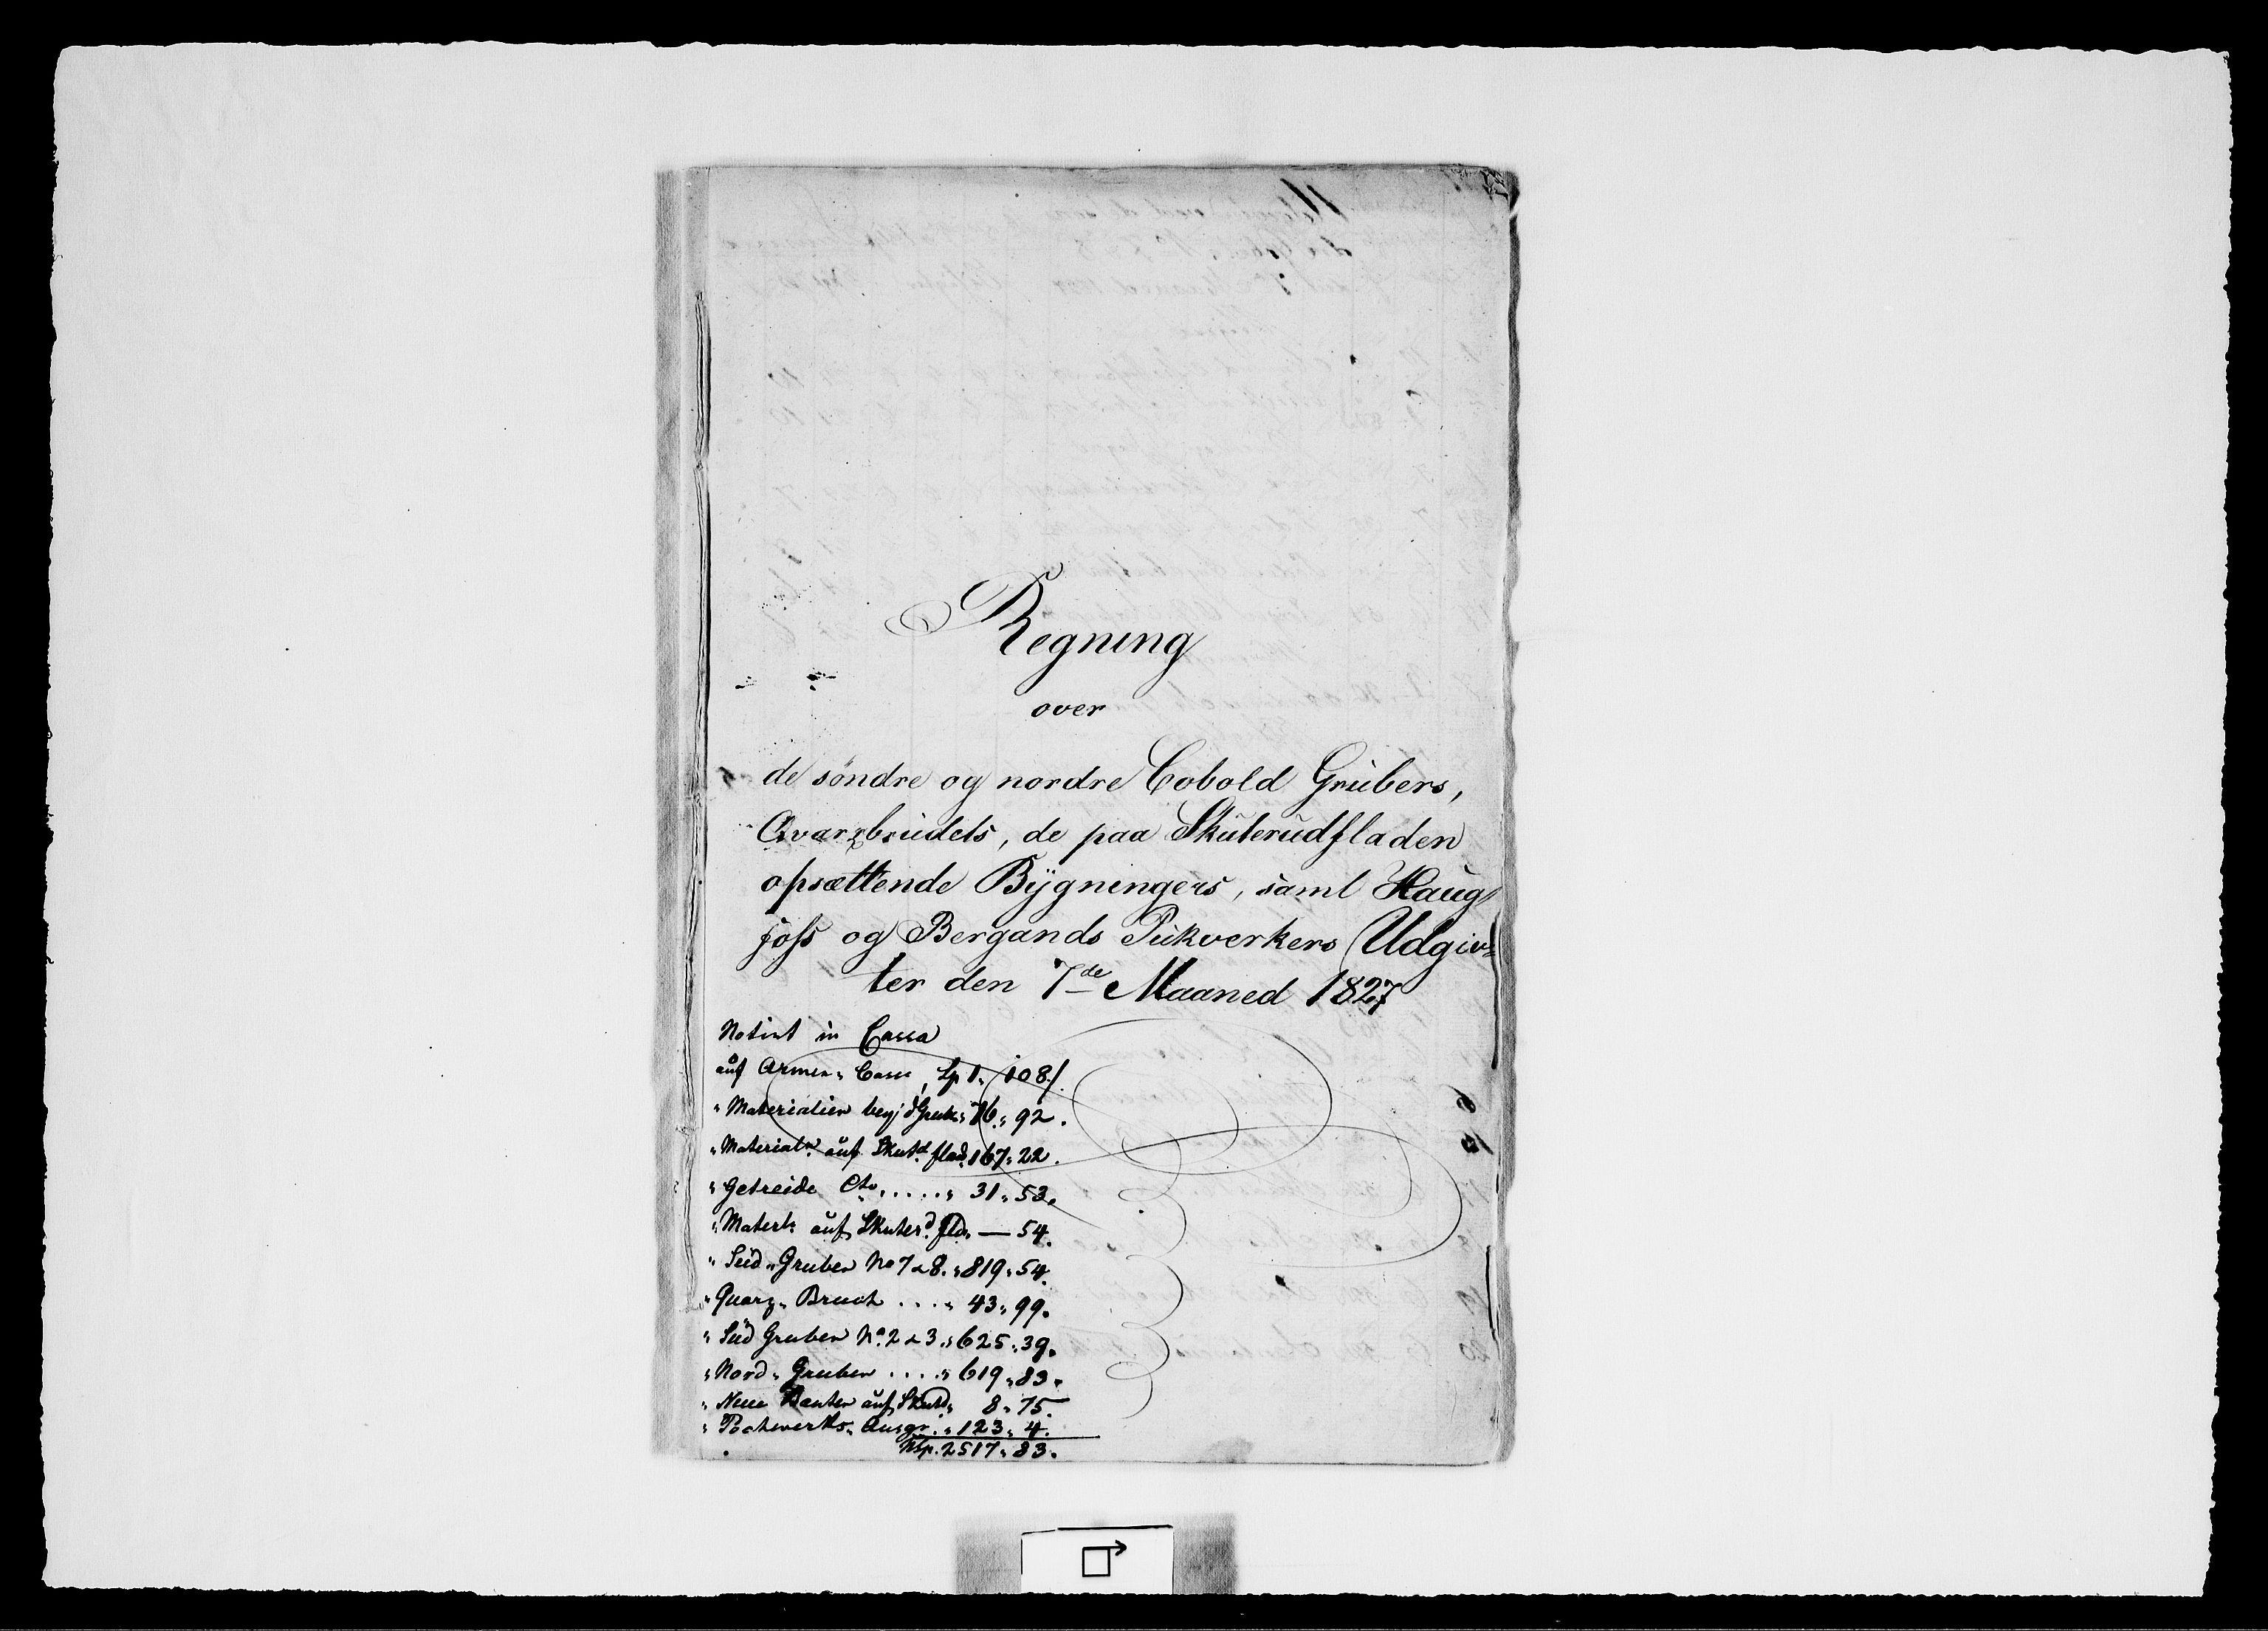 RA, Modums Blaafarveværk, G/Gd/Gdd/L0256, 1827-1828, s. 2